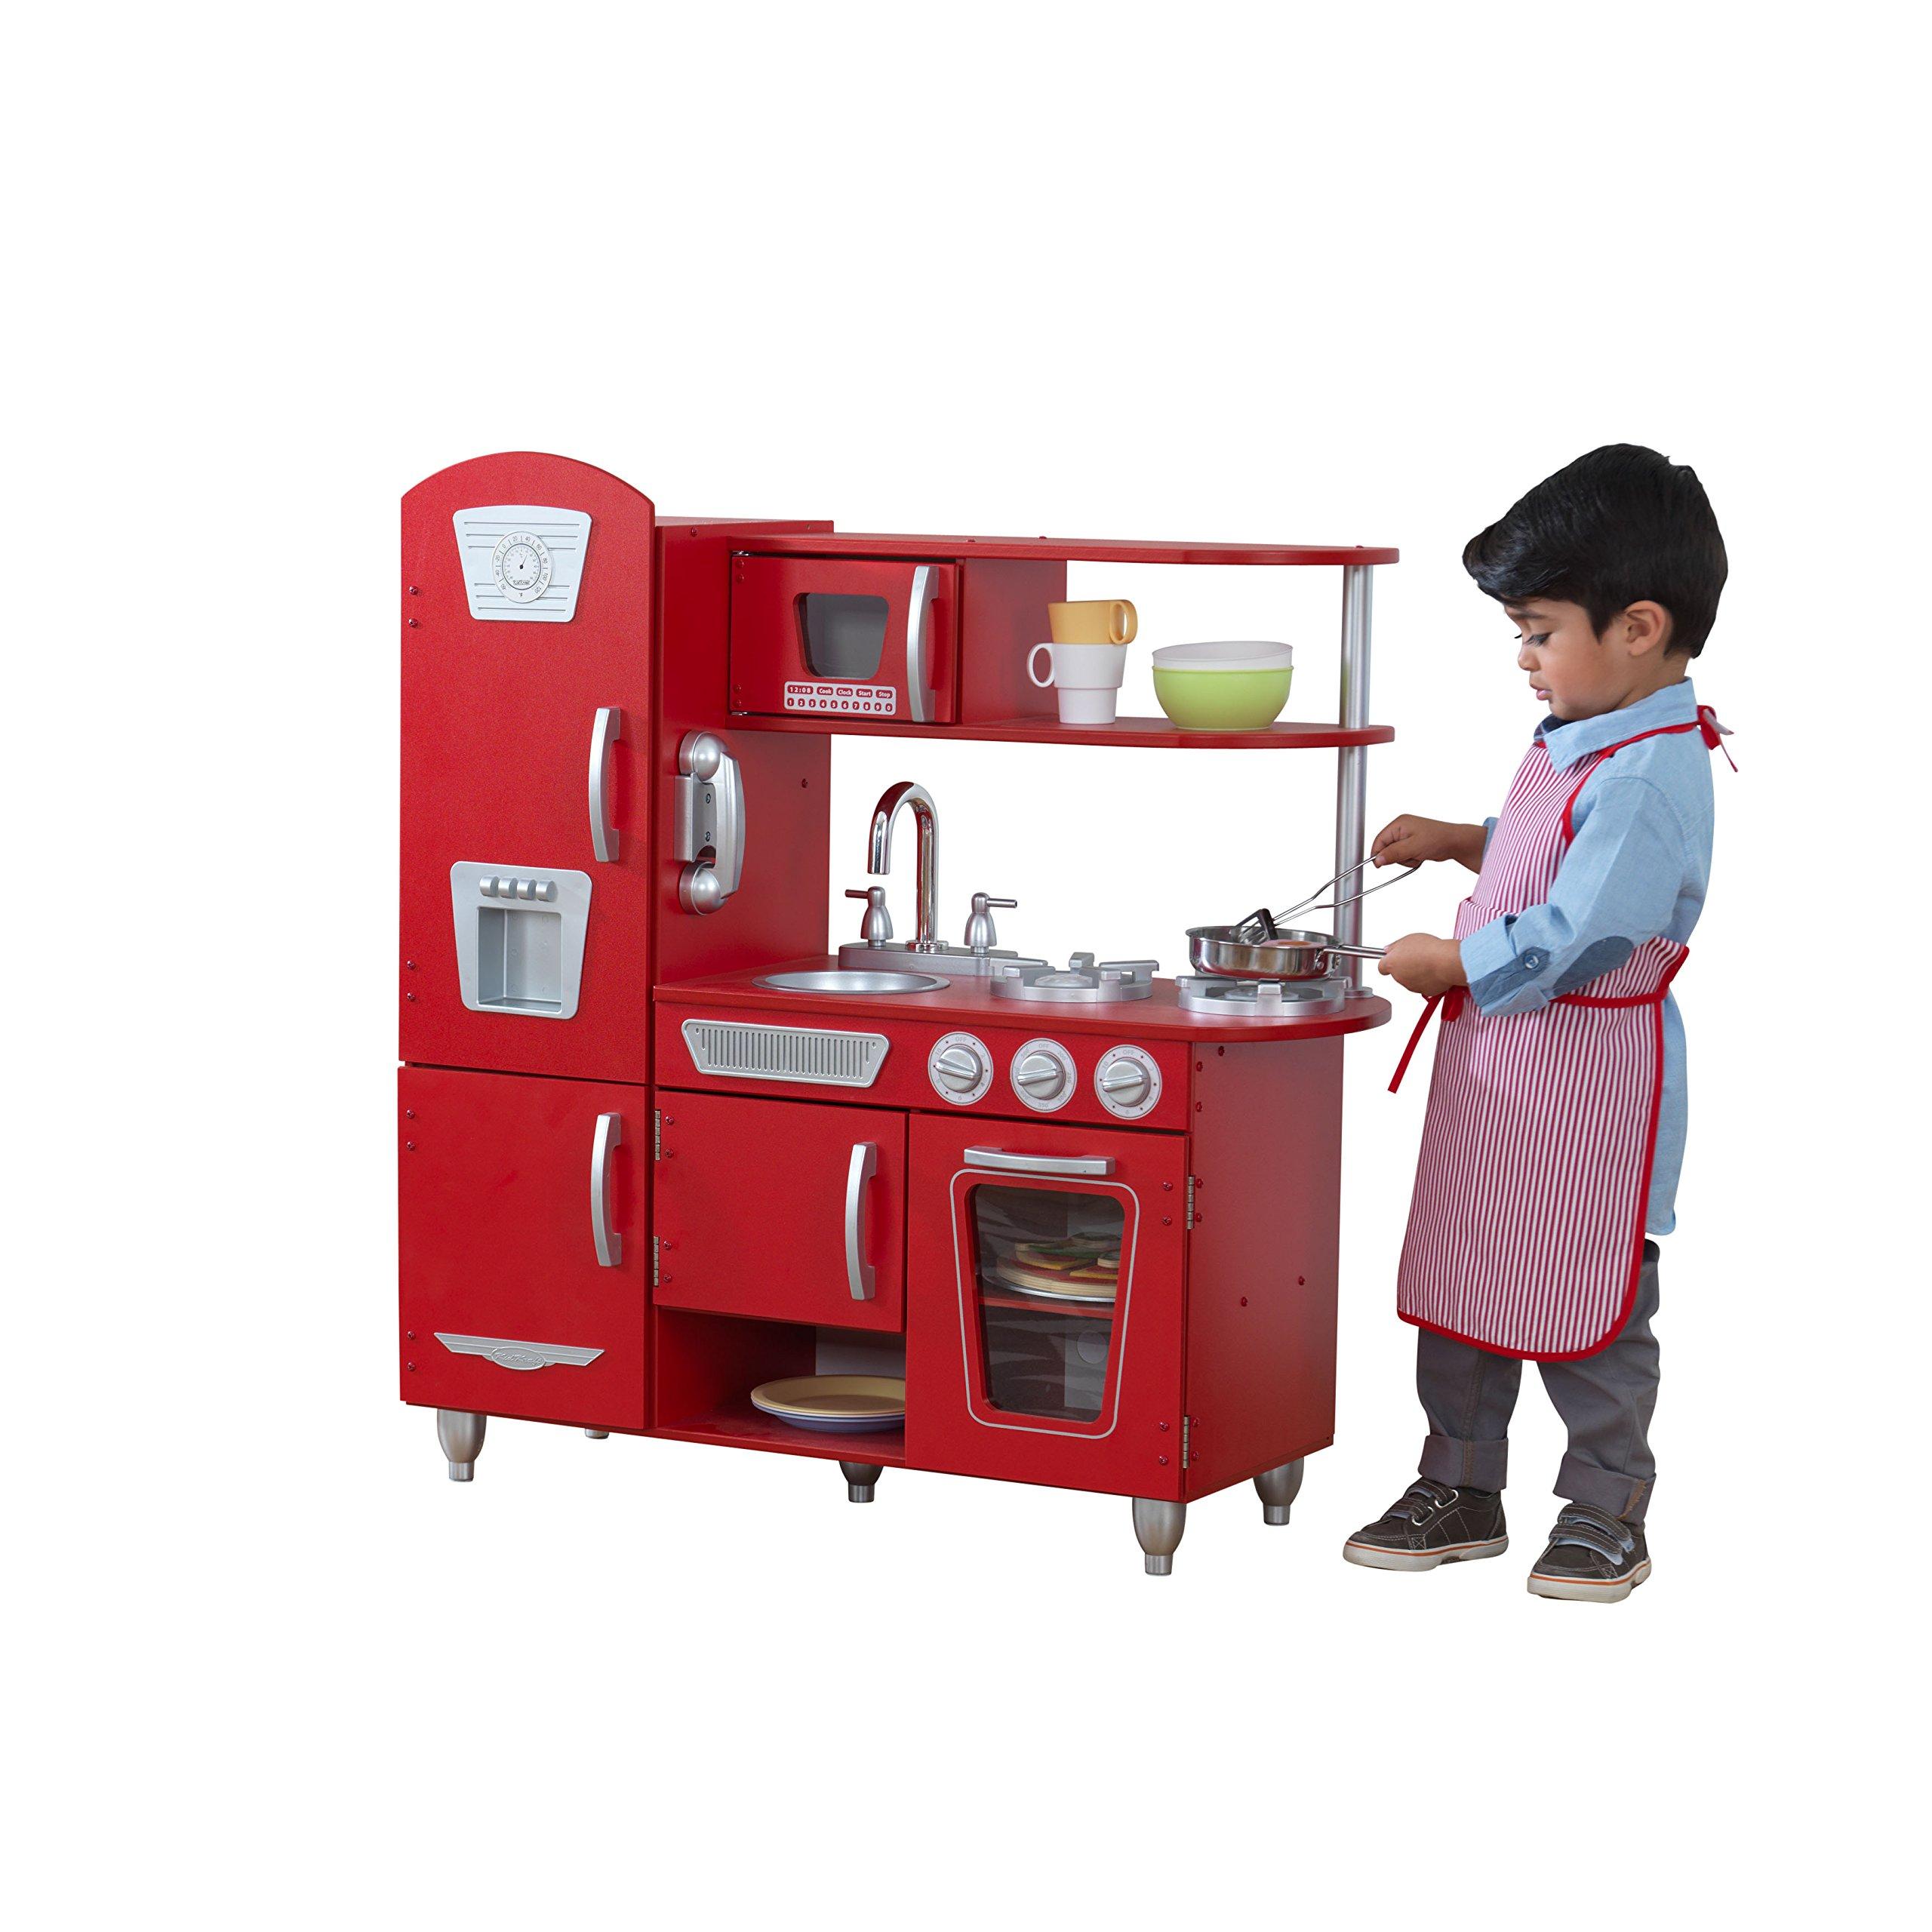 KidKraft Vintage Play Kitchen - Red by KidKraft (Image #2)